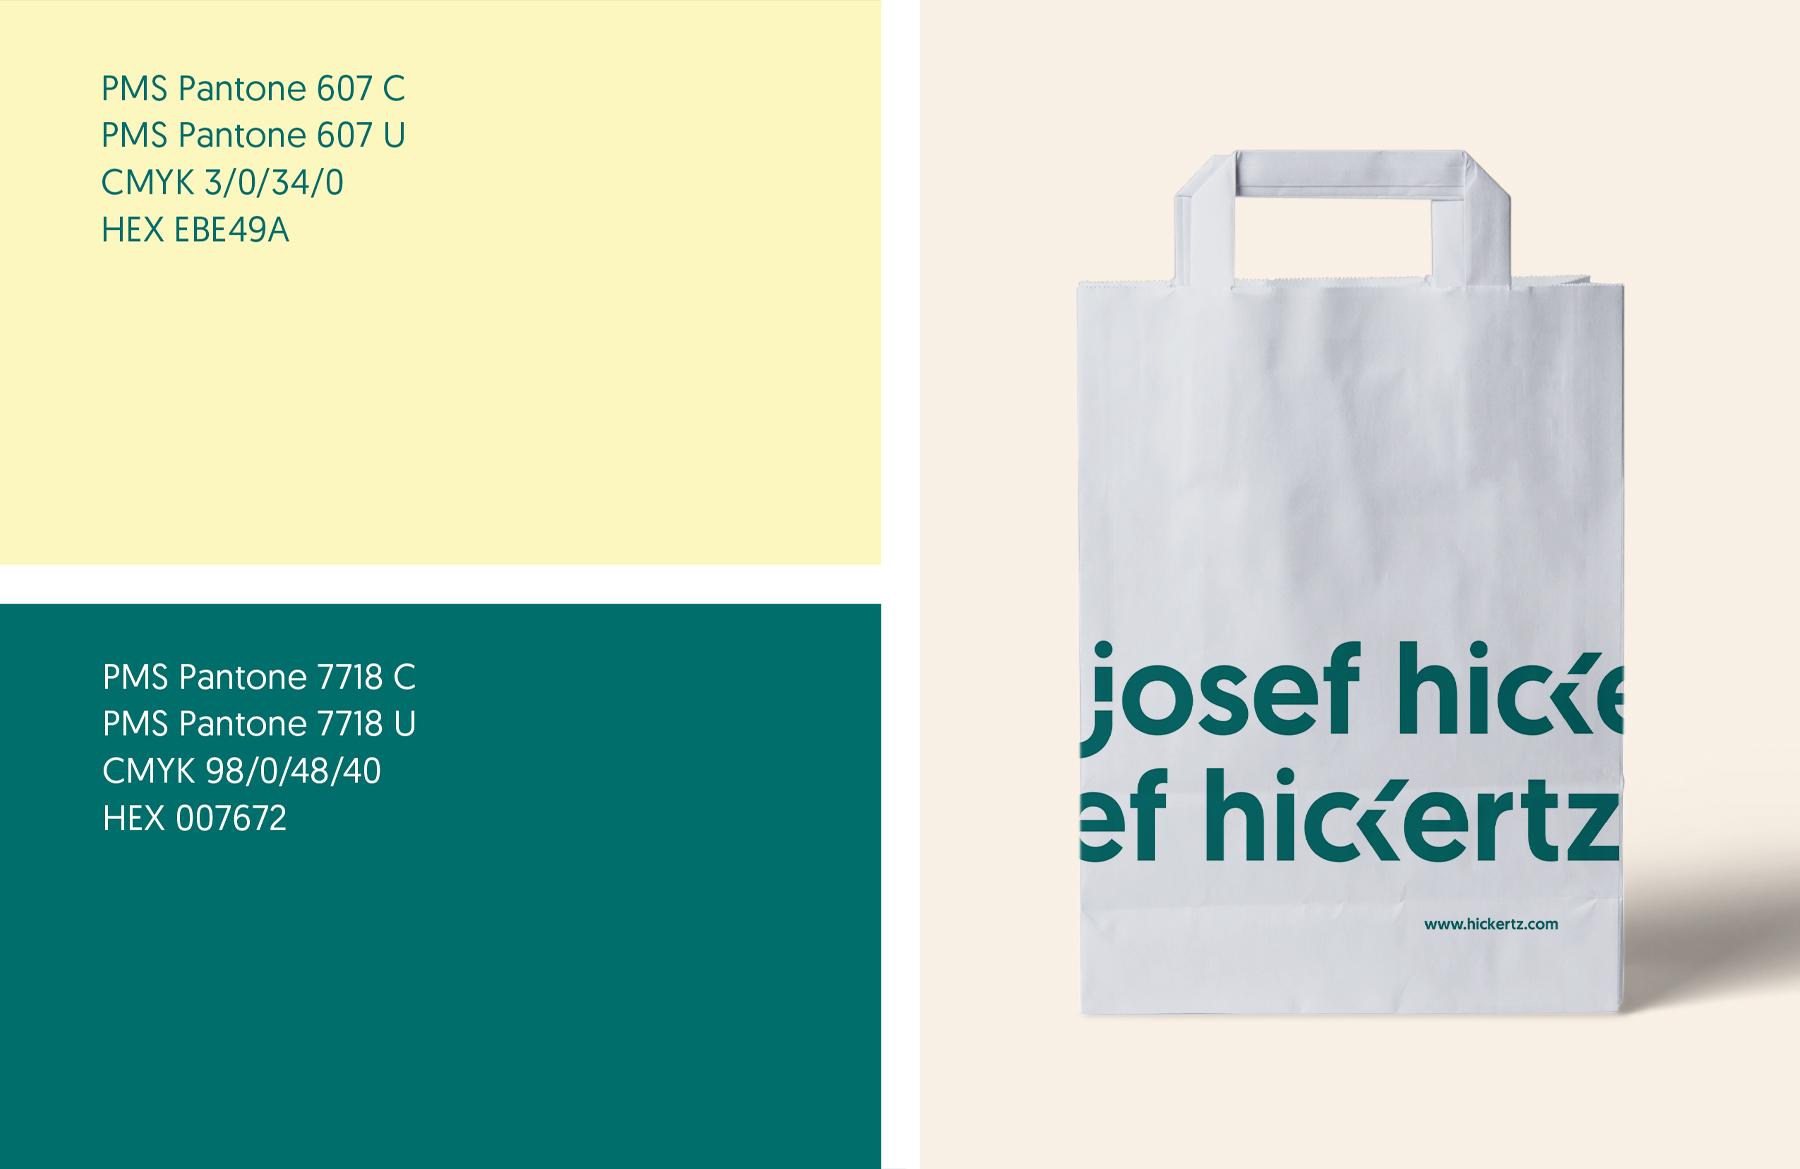 Hickertz-Farbkonzept